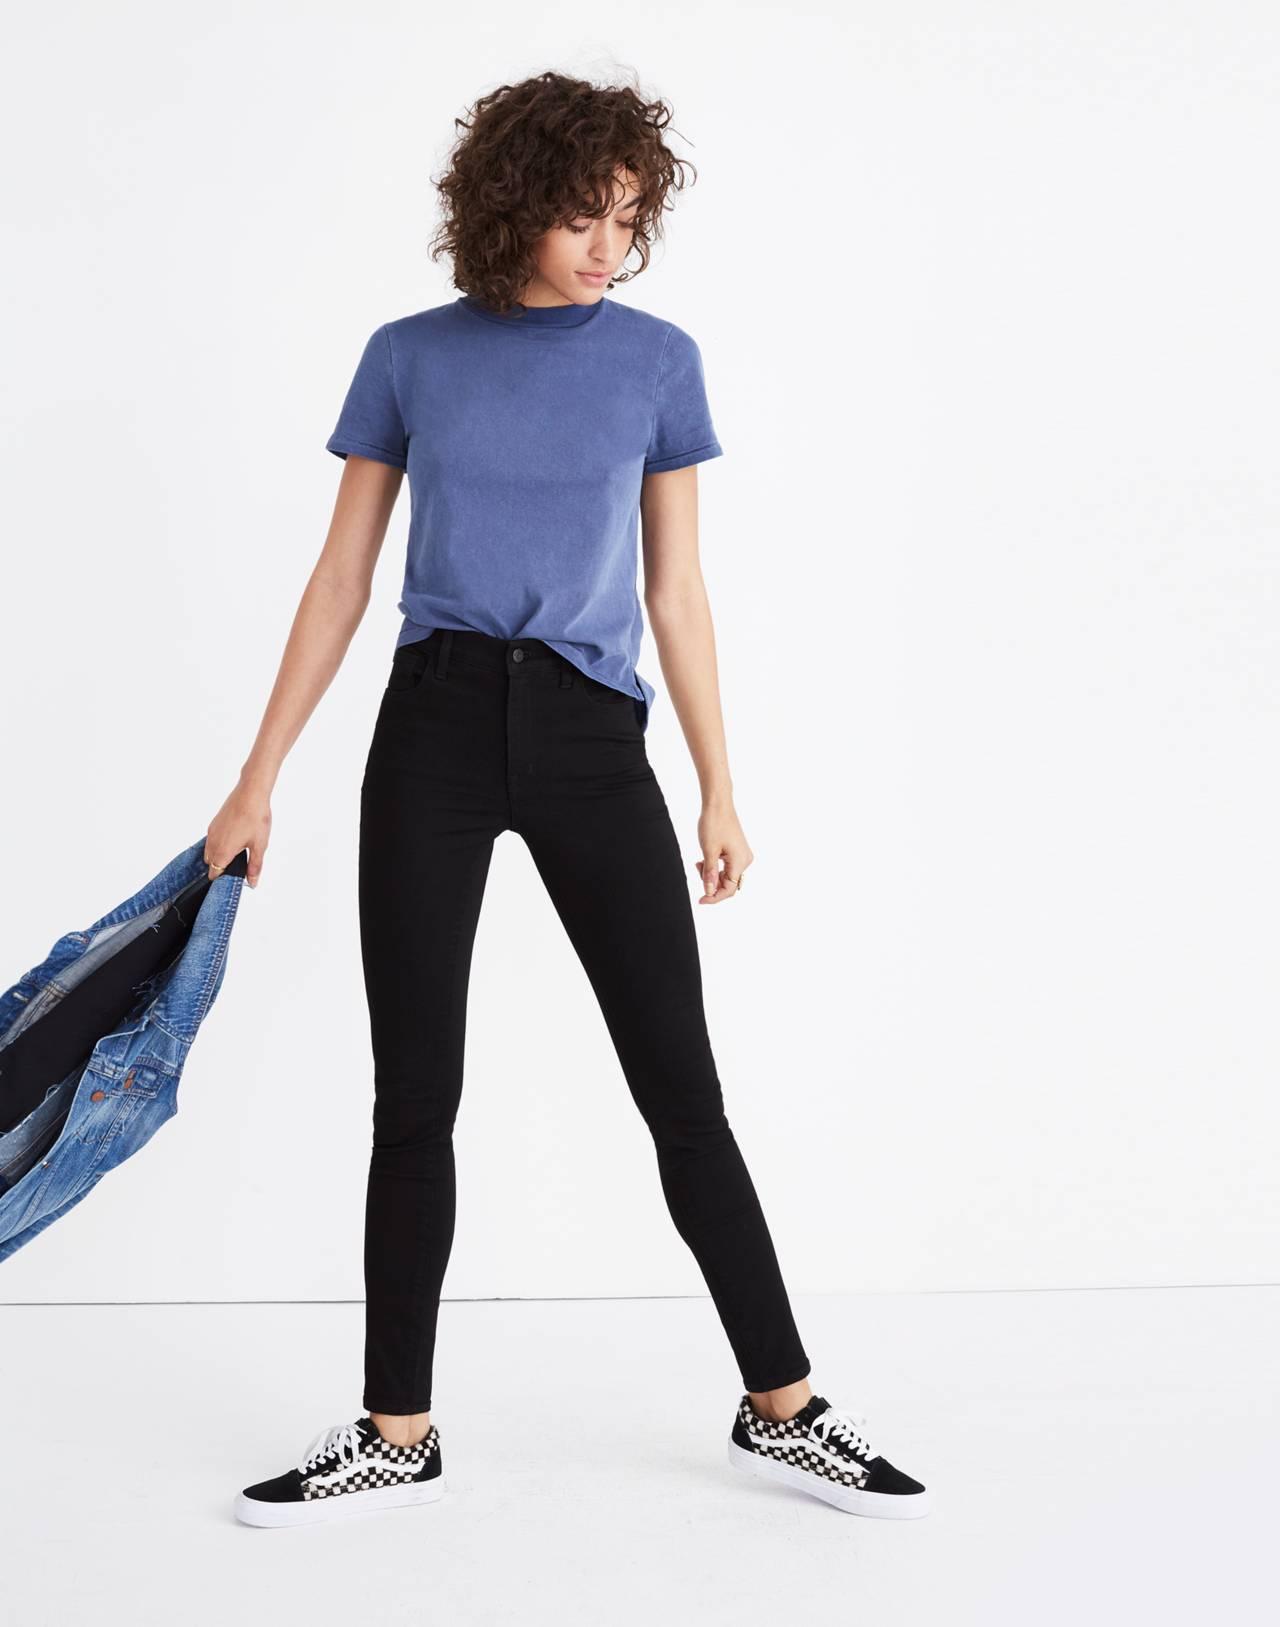 Petite Roadtripper Jeans in Bennett Black in bennett wash image 2